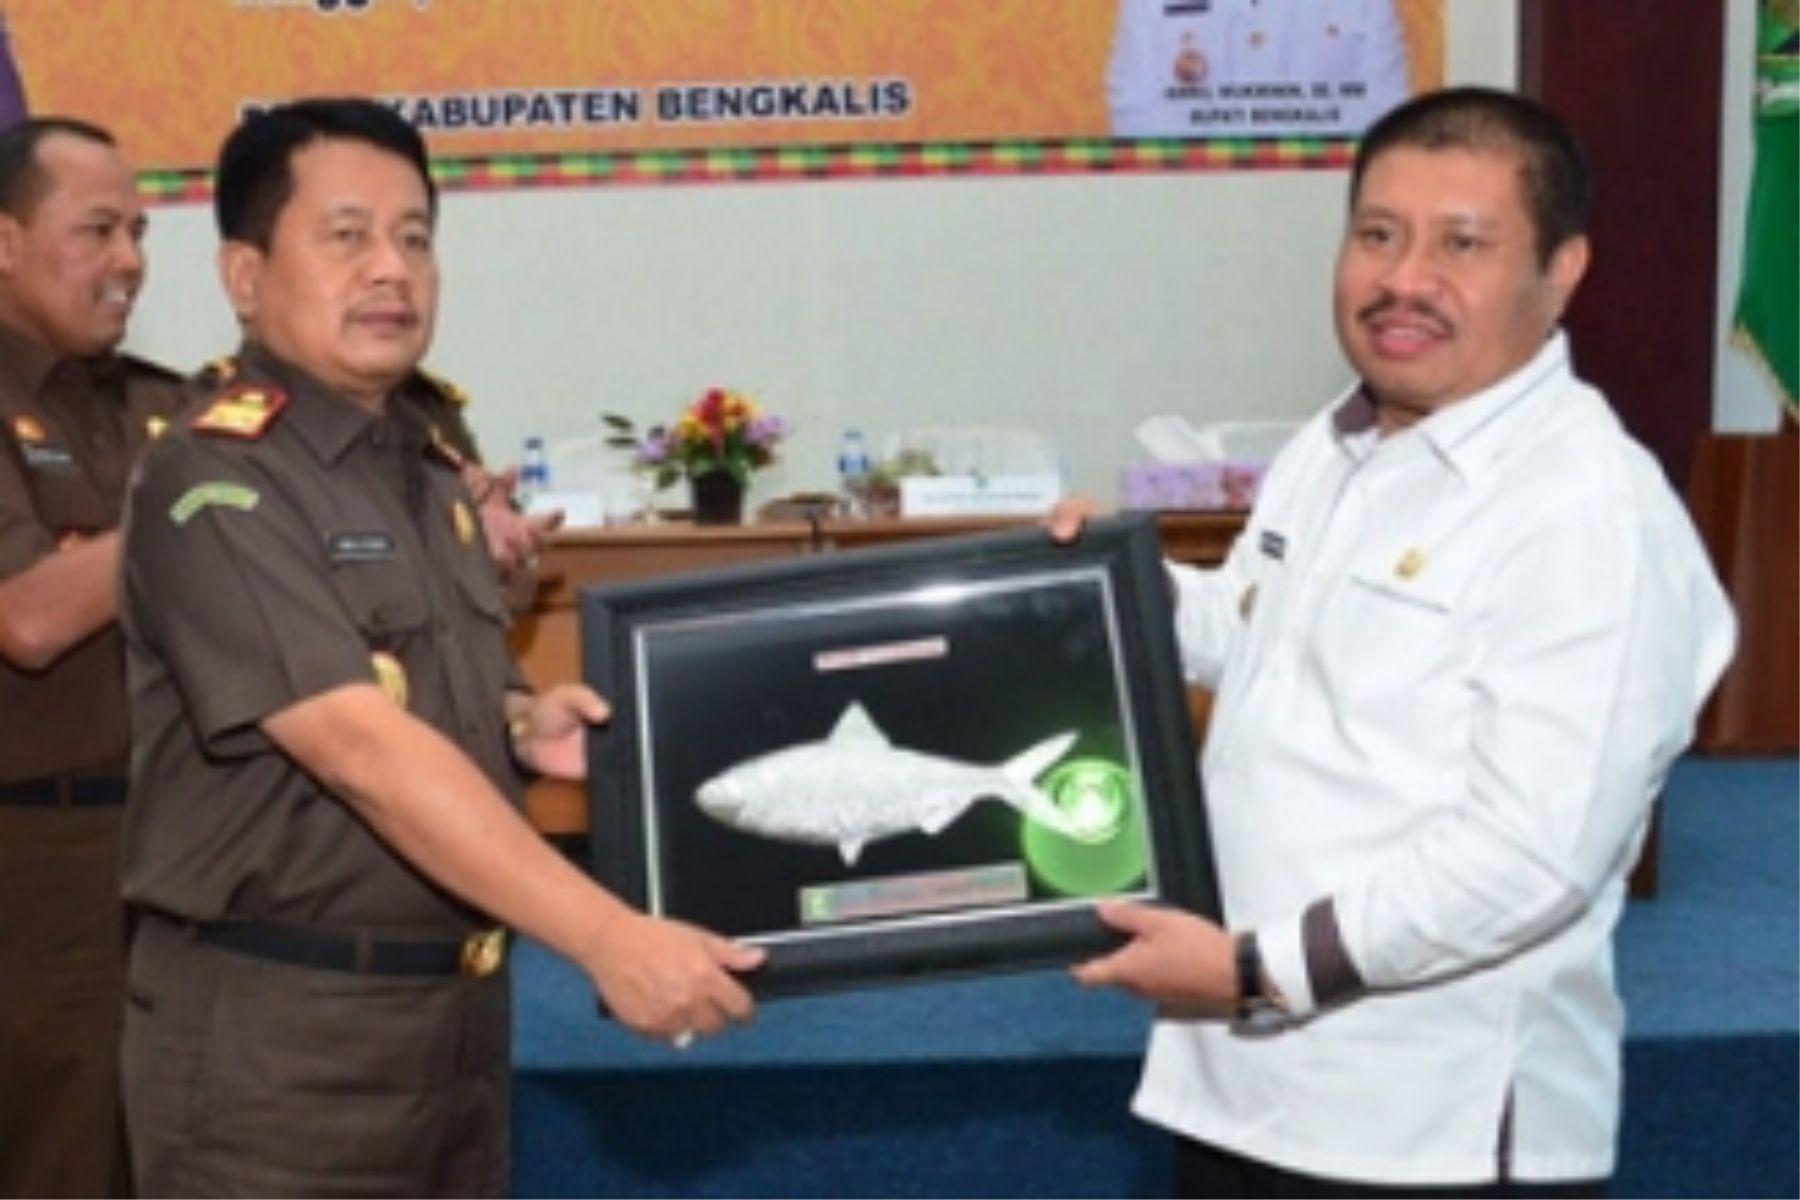 Bupati Amril Mukminin menyerahkan cendramata kepada Uung Abdul Syakur saat menjabat Kajati Riau dalam sebuah kesempatan di Pekanbaru